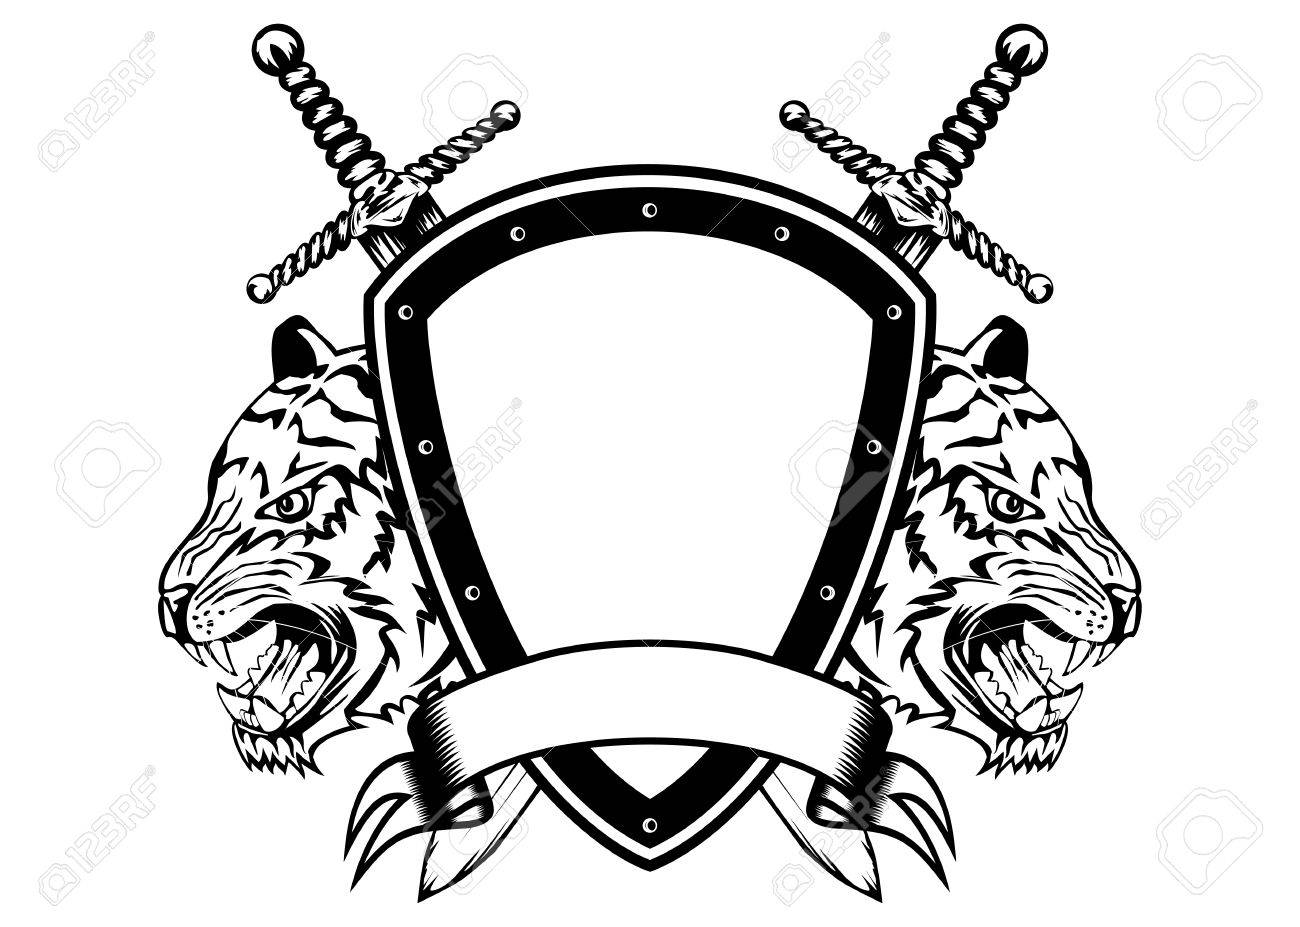 Knight Head Clipart